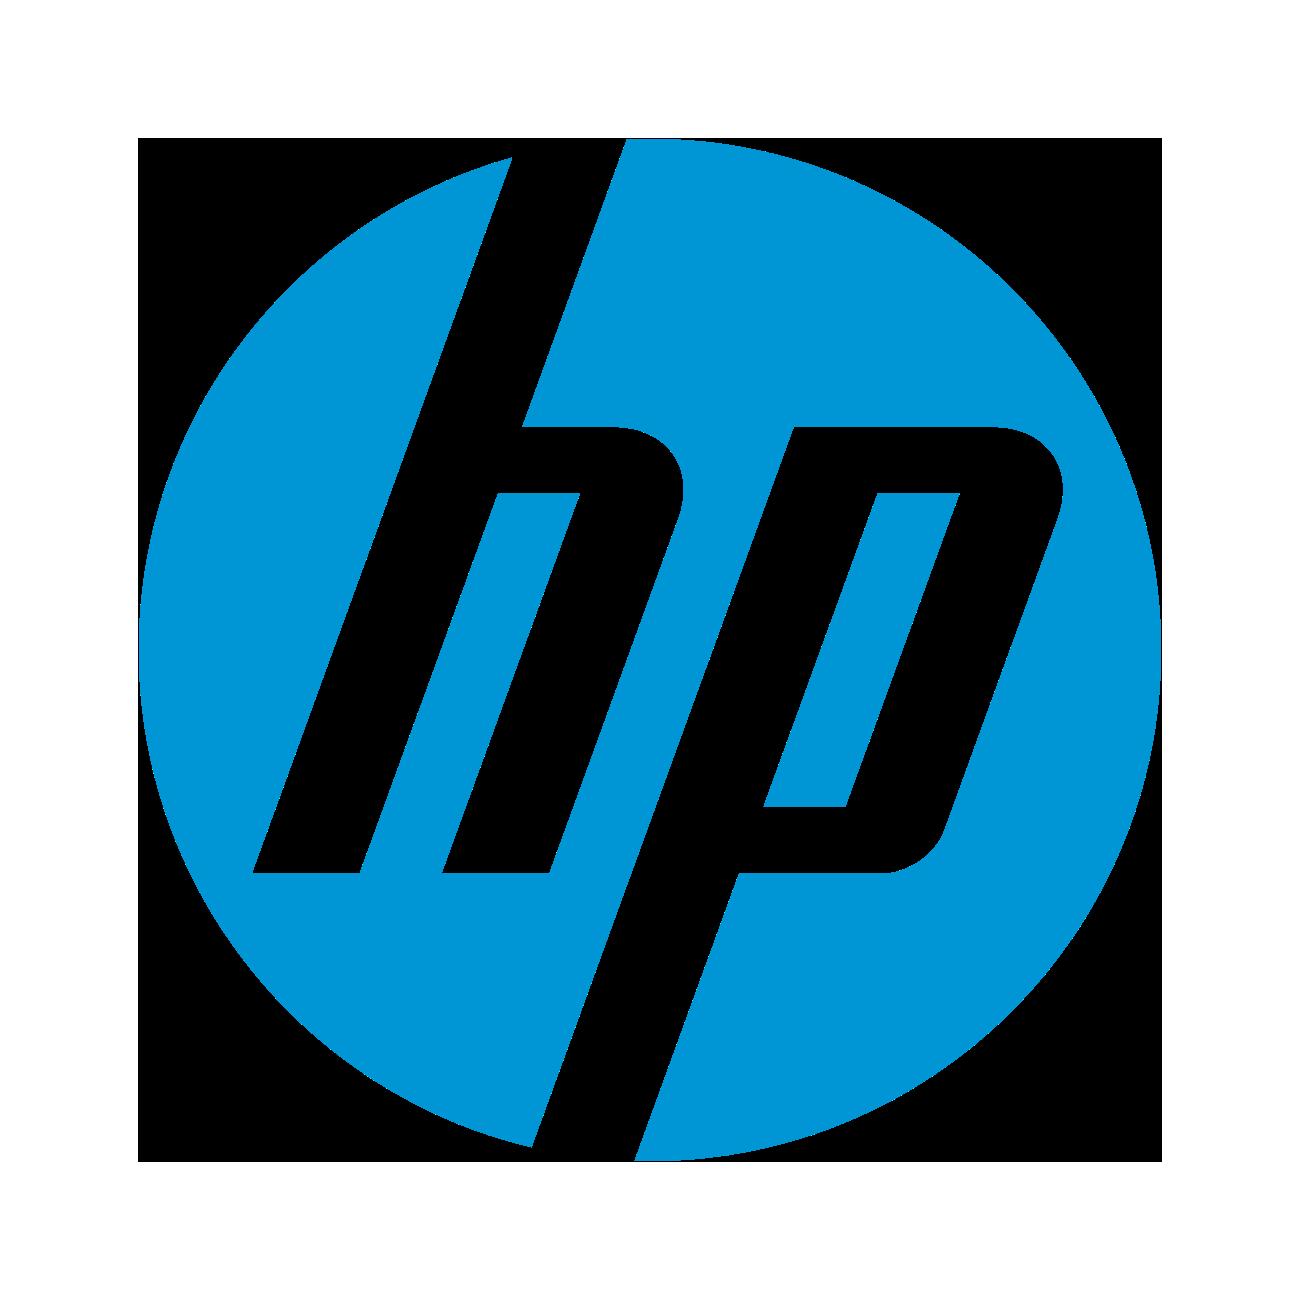 HP Z1 G6 Workstation - Intel Core i7 Octa-core (8 Core) i7-10700K 10th Gen 3.80 GHz - 32 GB DDR4 SDRAM RAM - 2 TB HDD - 512 GB SSD - Tower